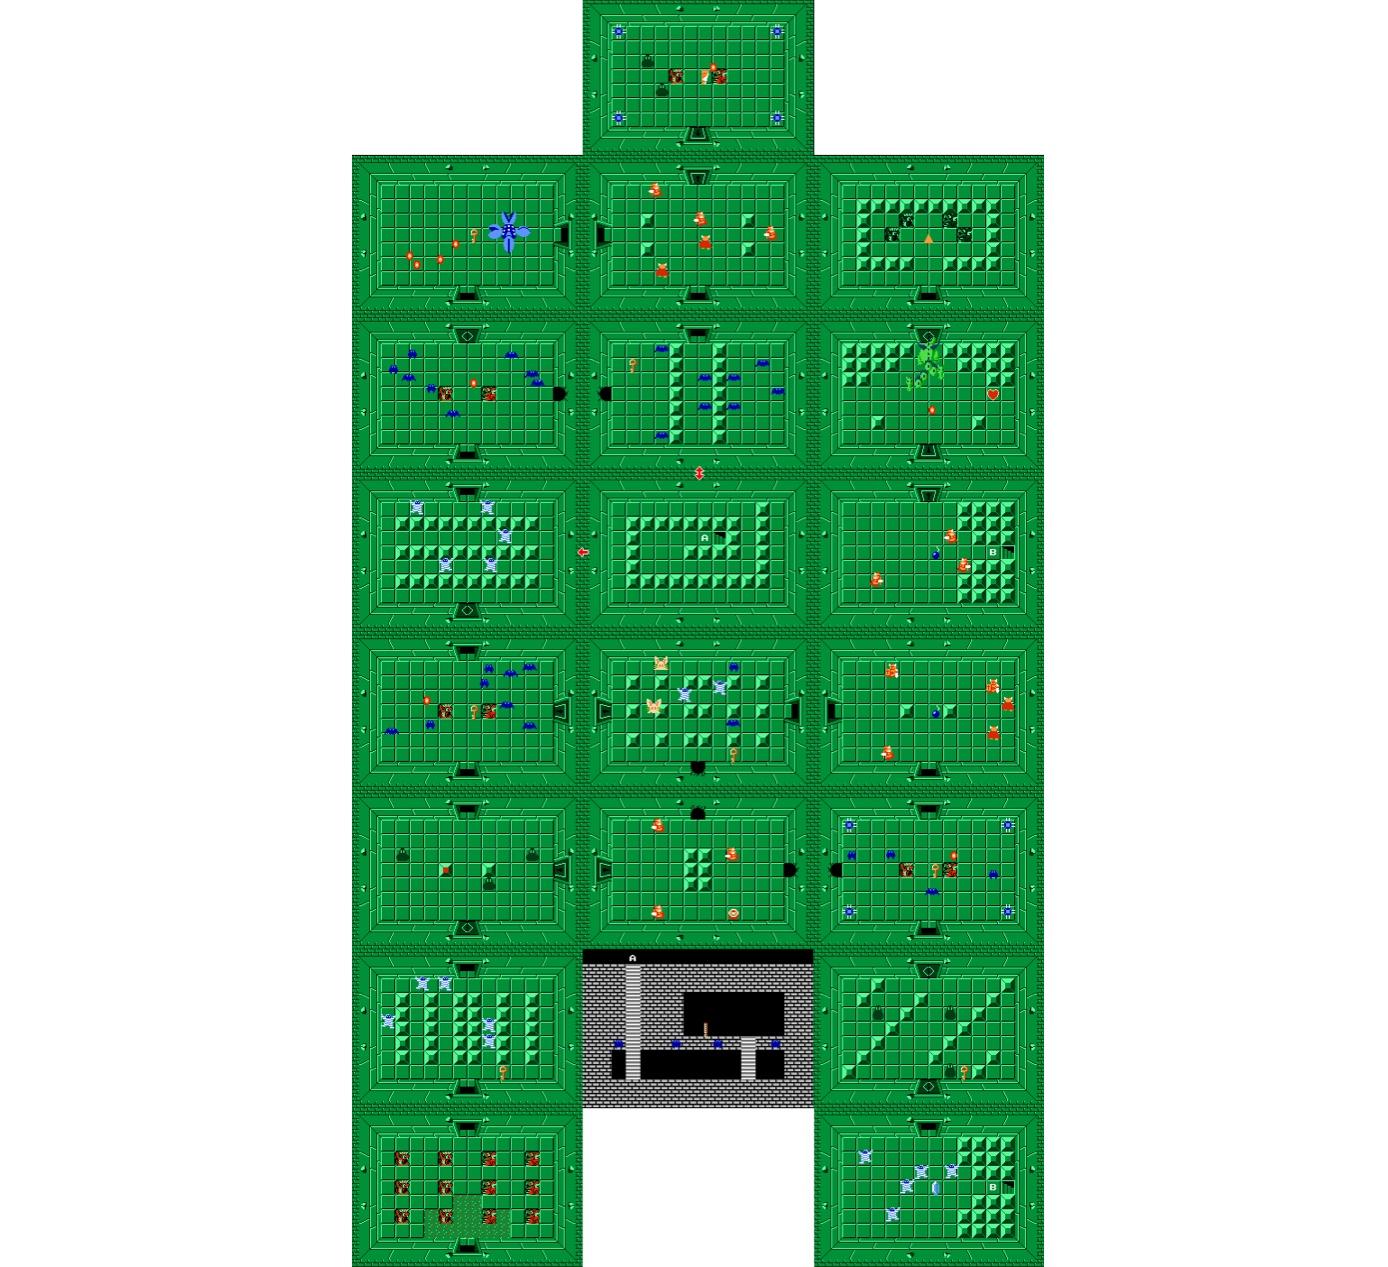 Level 2 Second Quest Zeldapedia Fandom